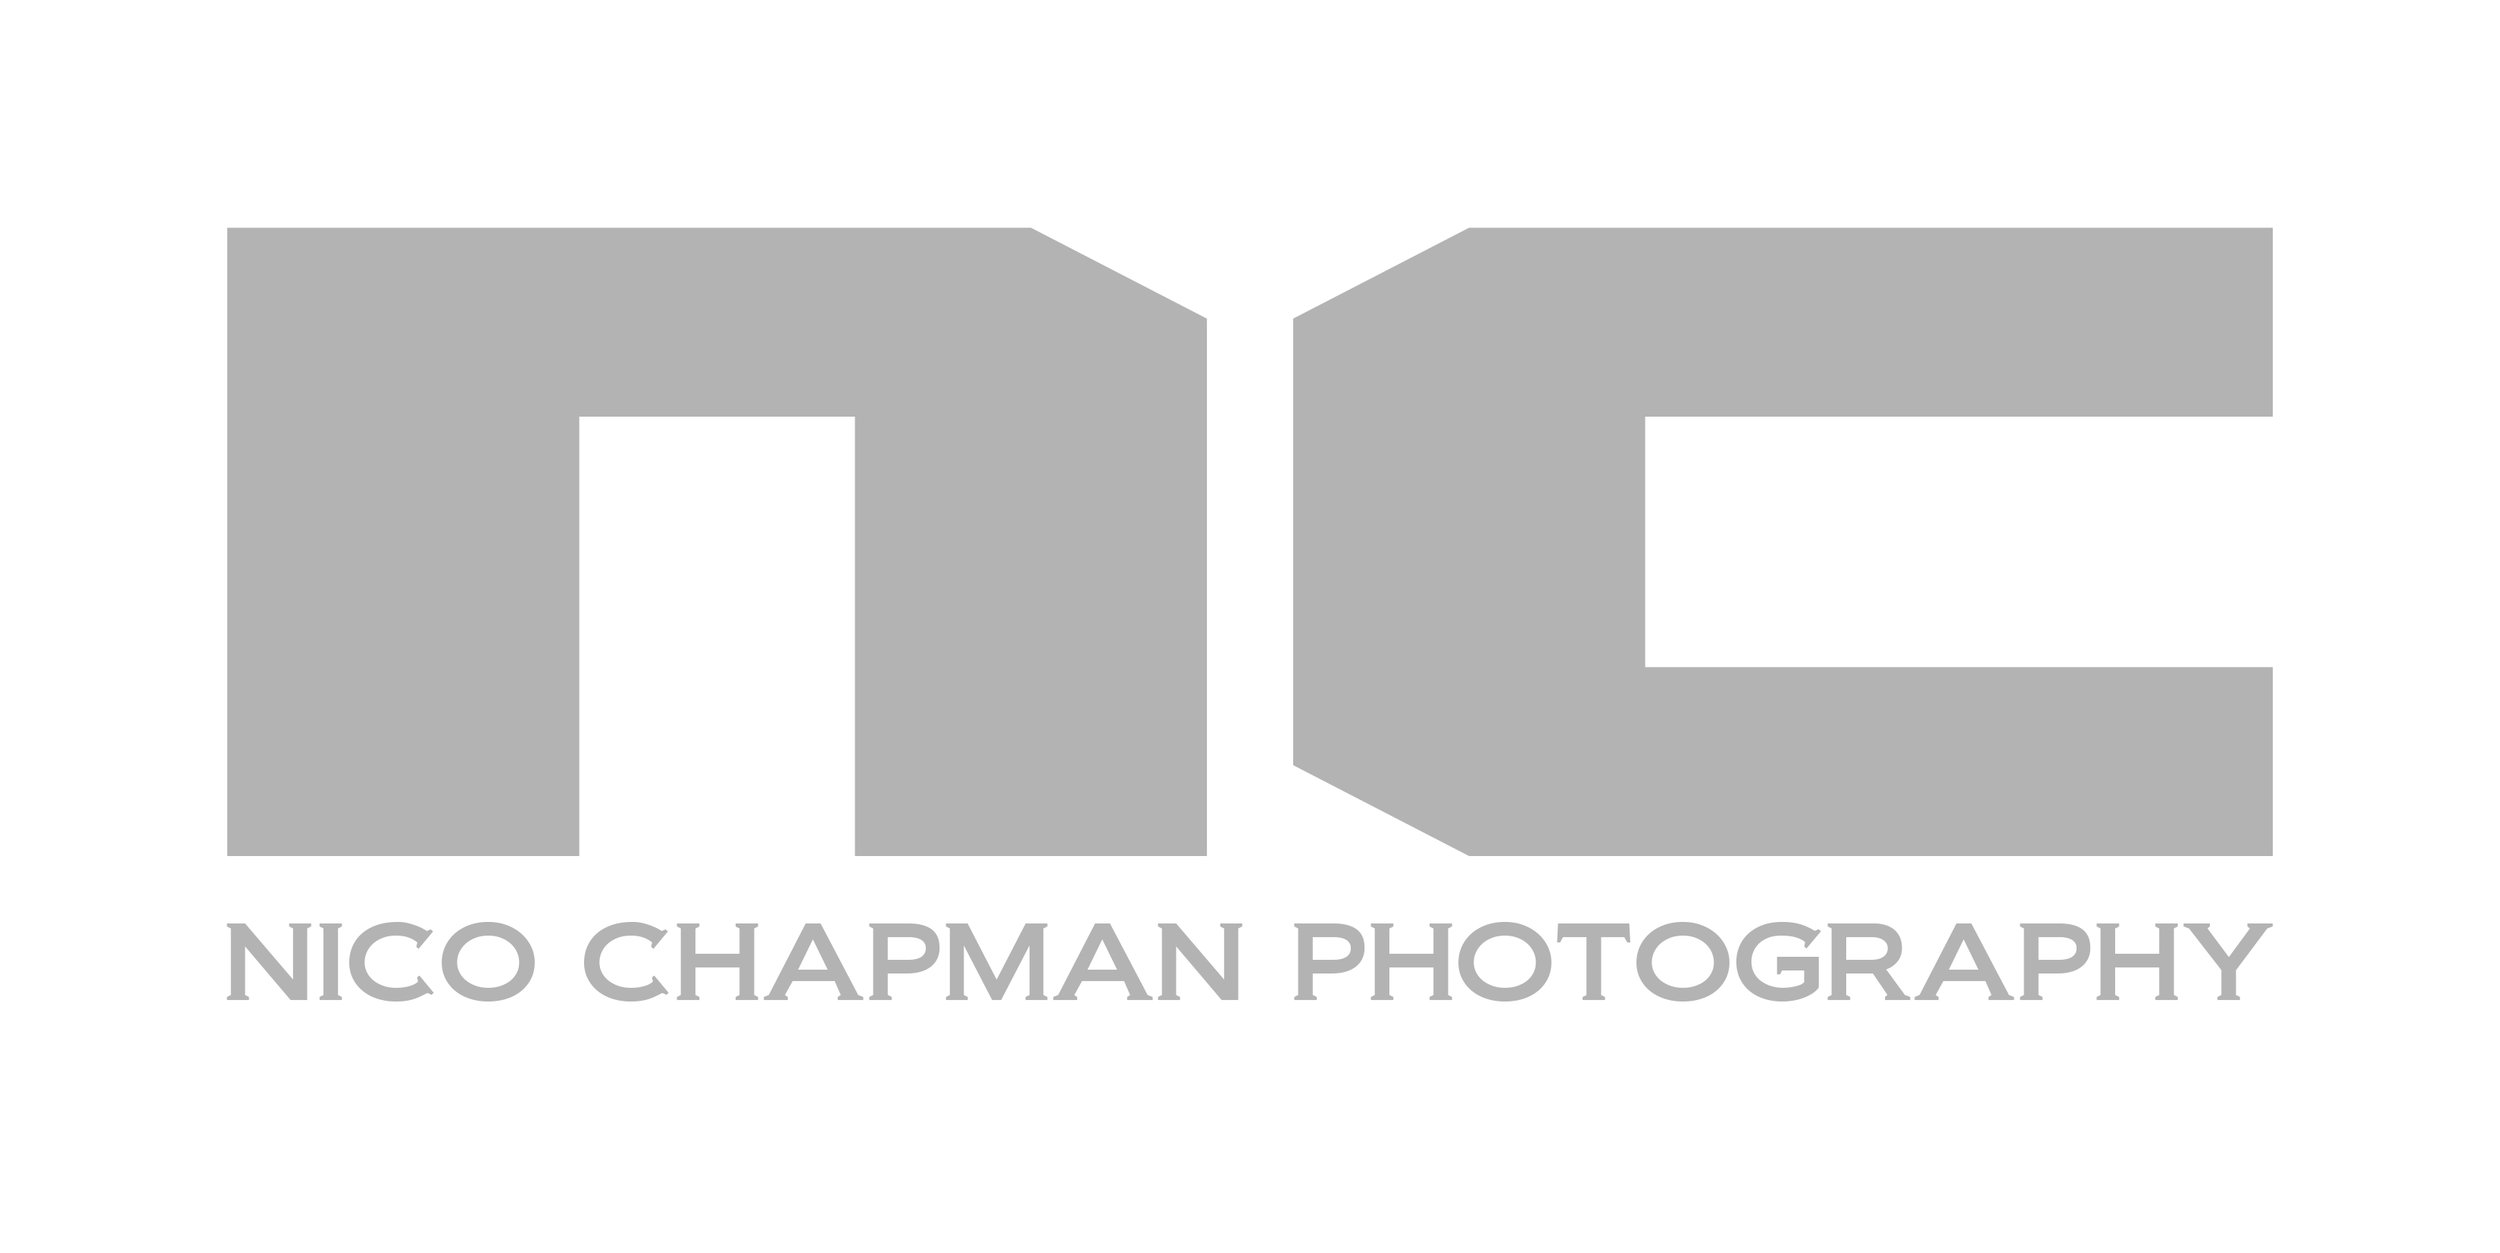 Nico Chapman photography Logo.jpg